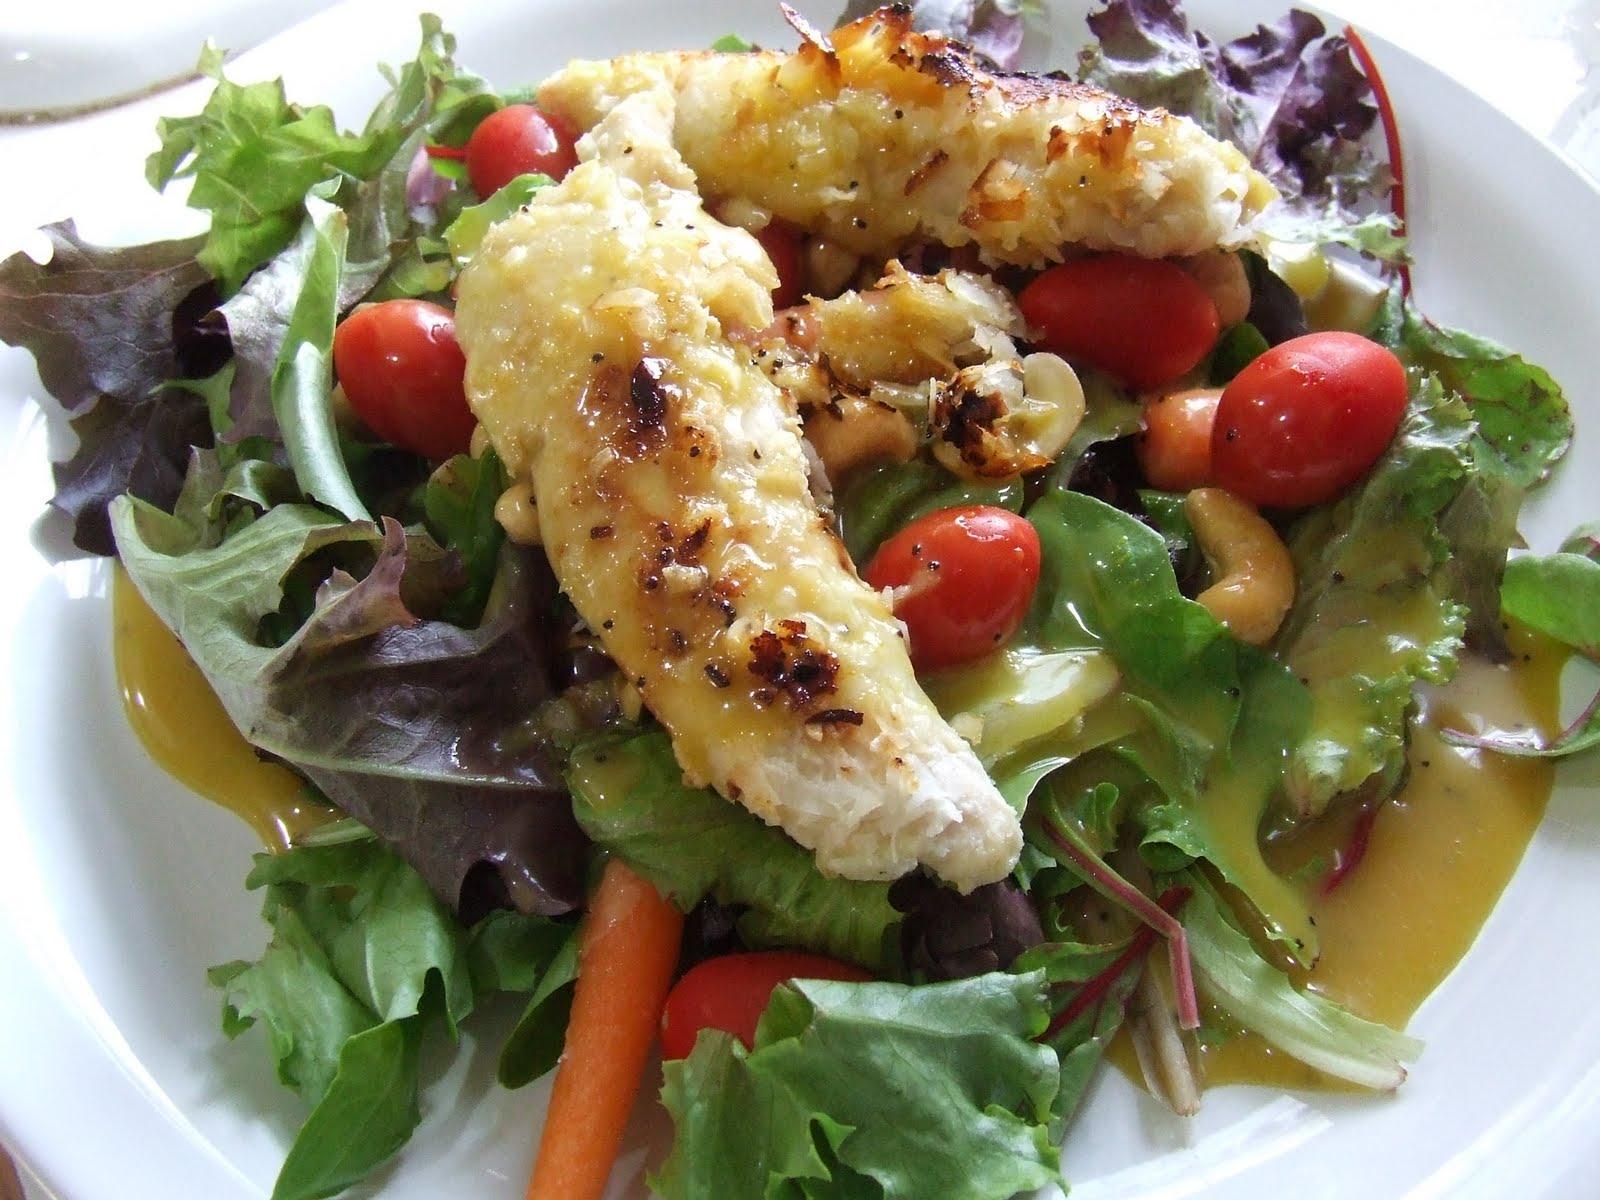 Coconut Chicken Salad with Warm Honey Mustard Vinaigrette